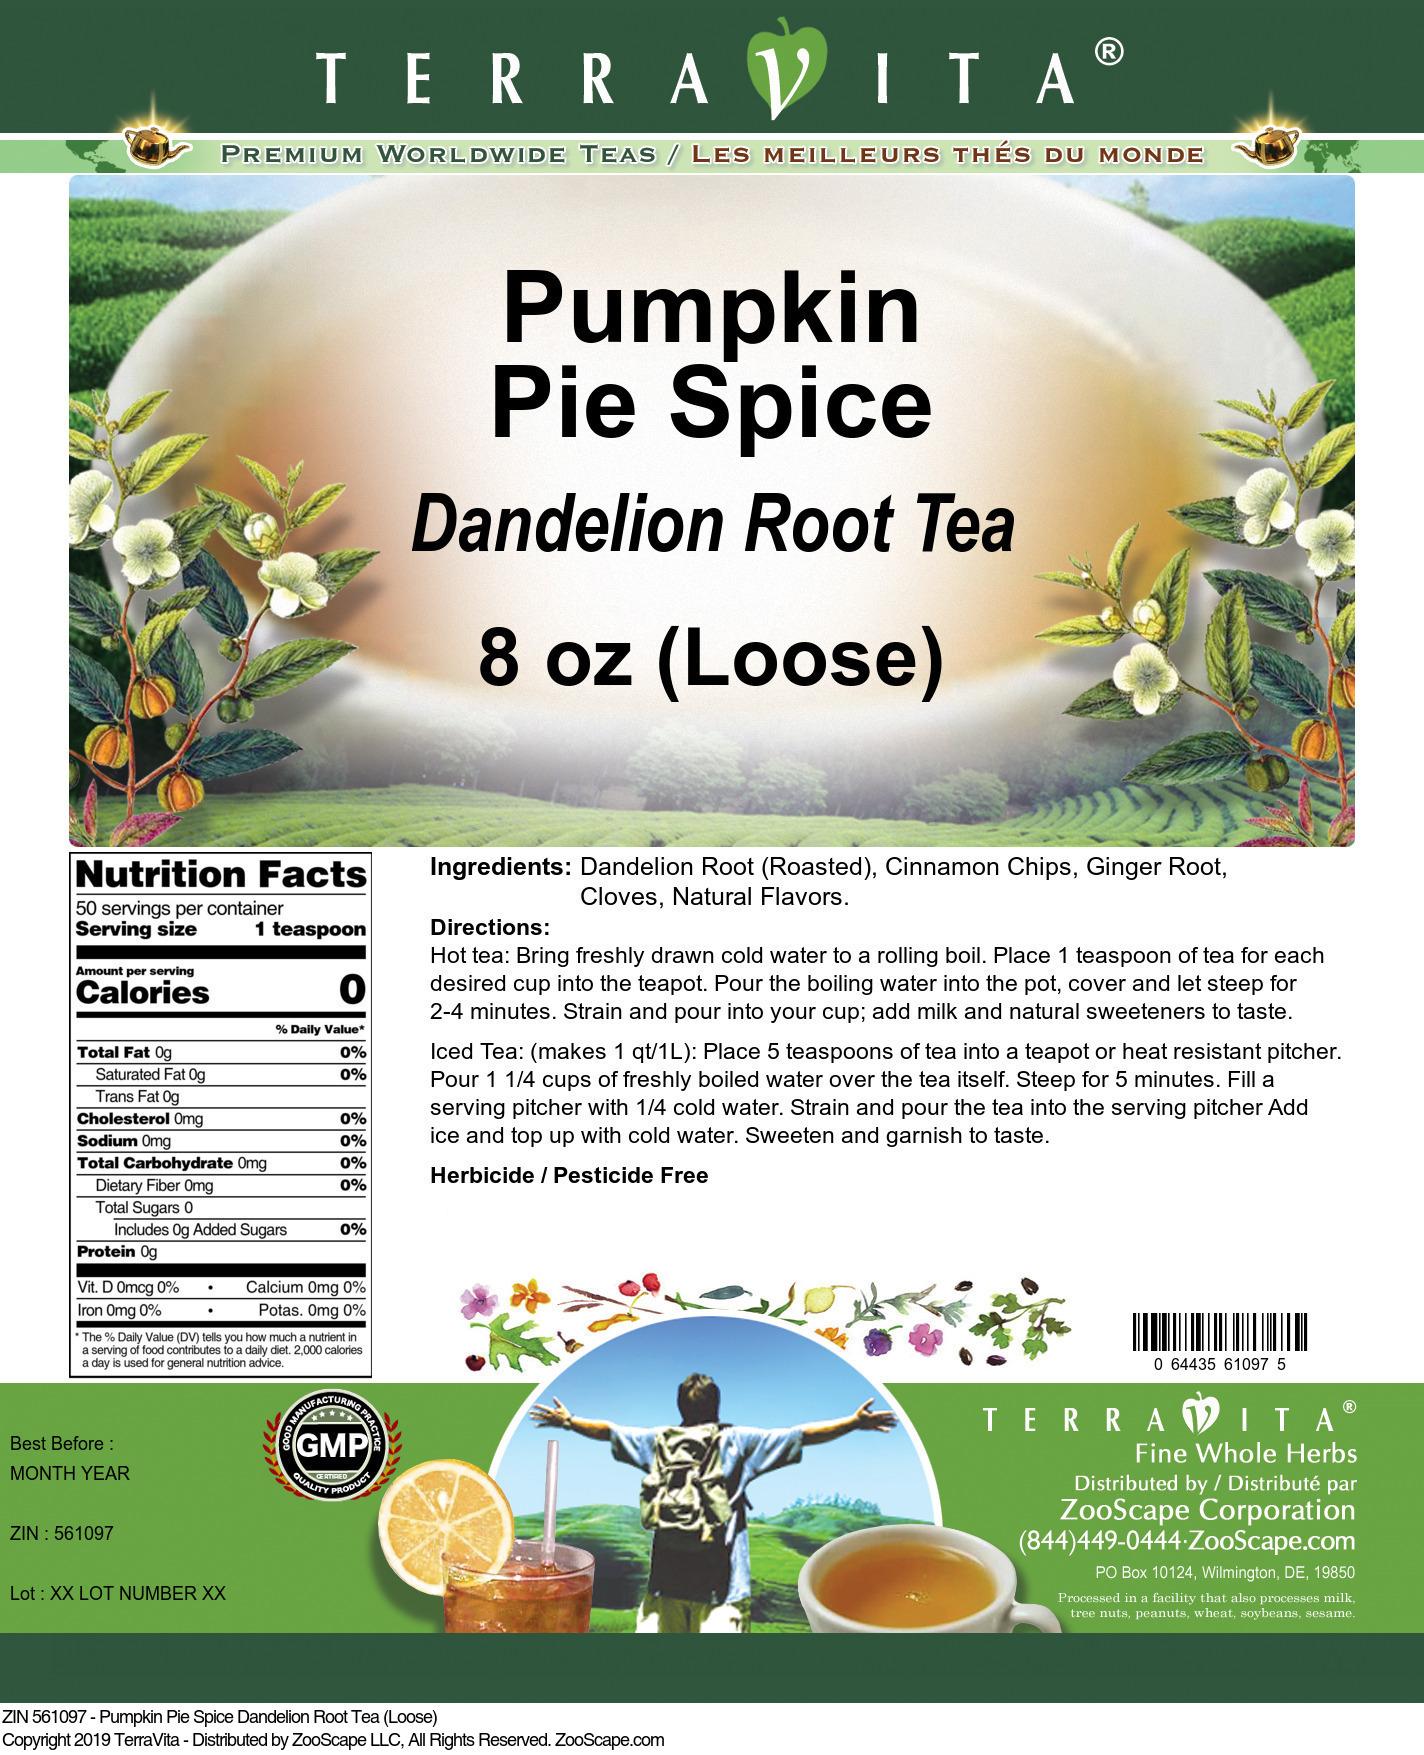 Pumpkin Pie Spice Dandelion Root Tea (Loose)